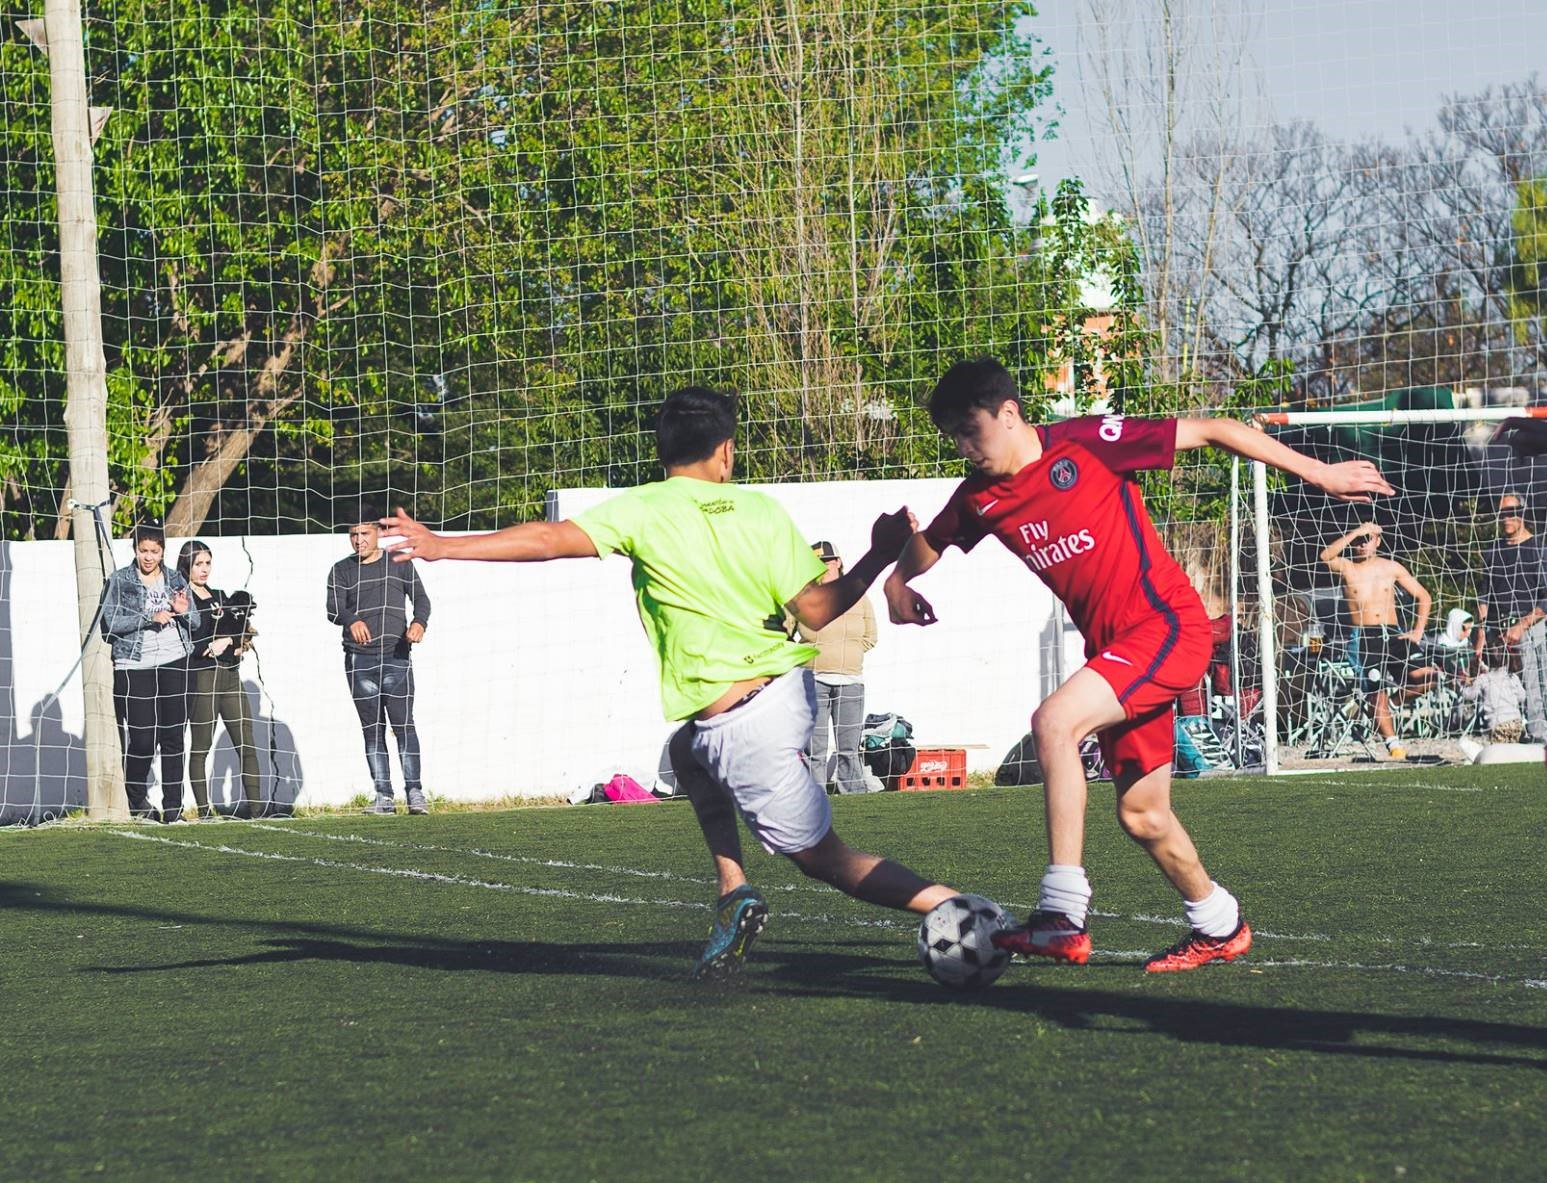 Torneo de Fútbol en Córdoba: Della Testa